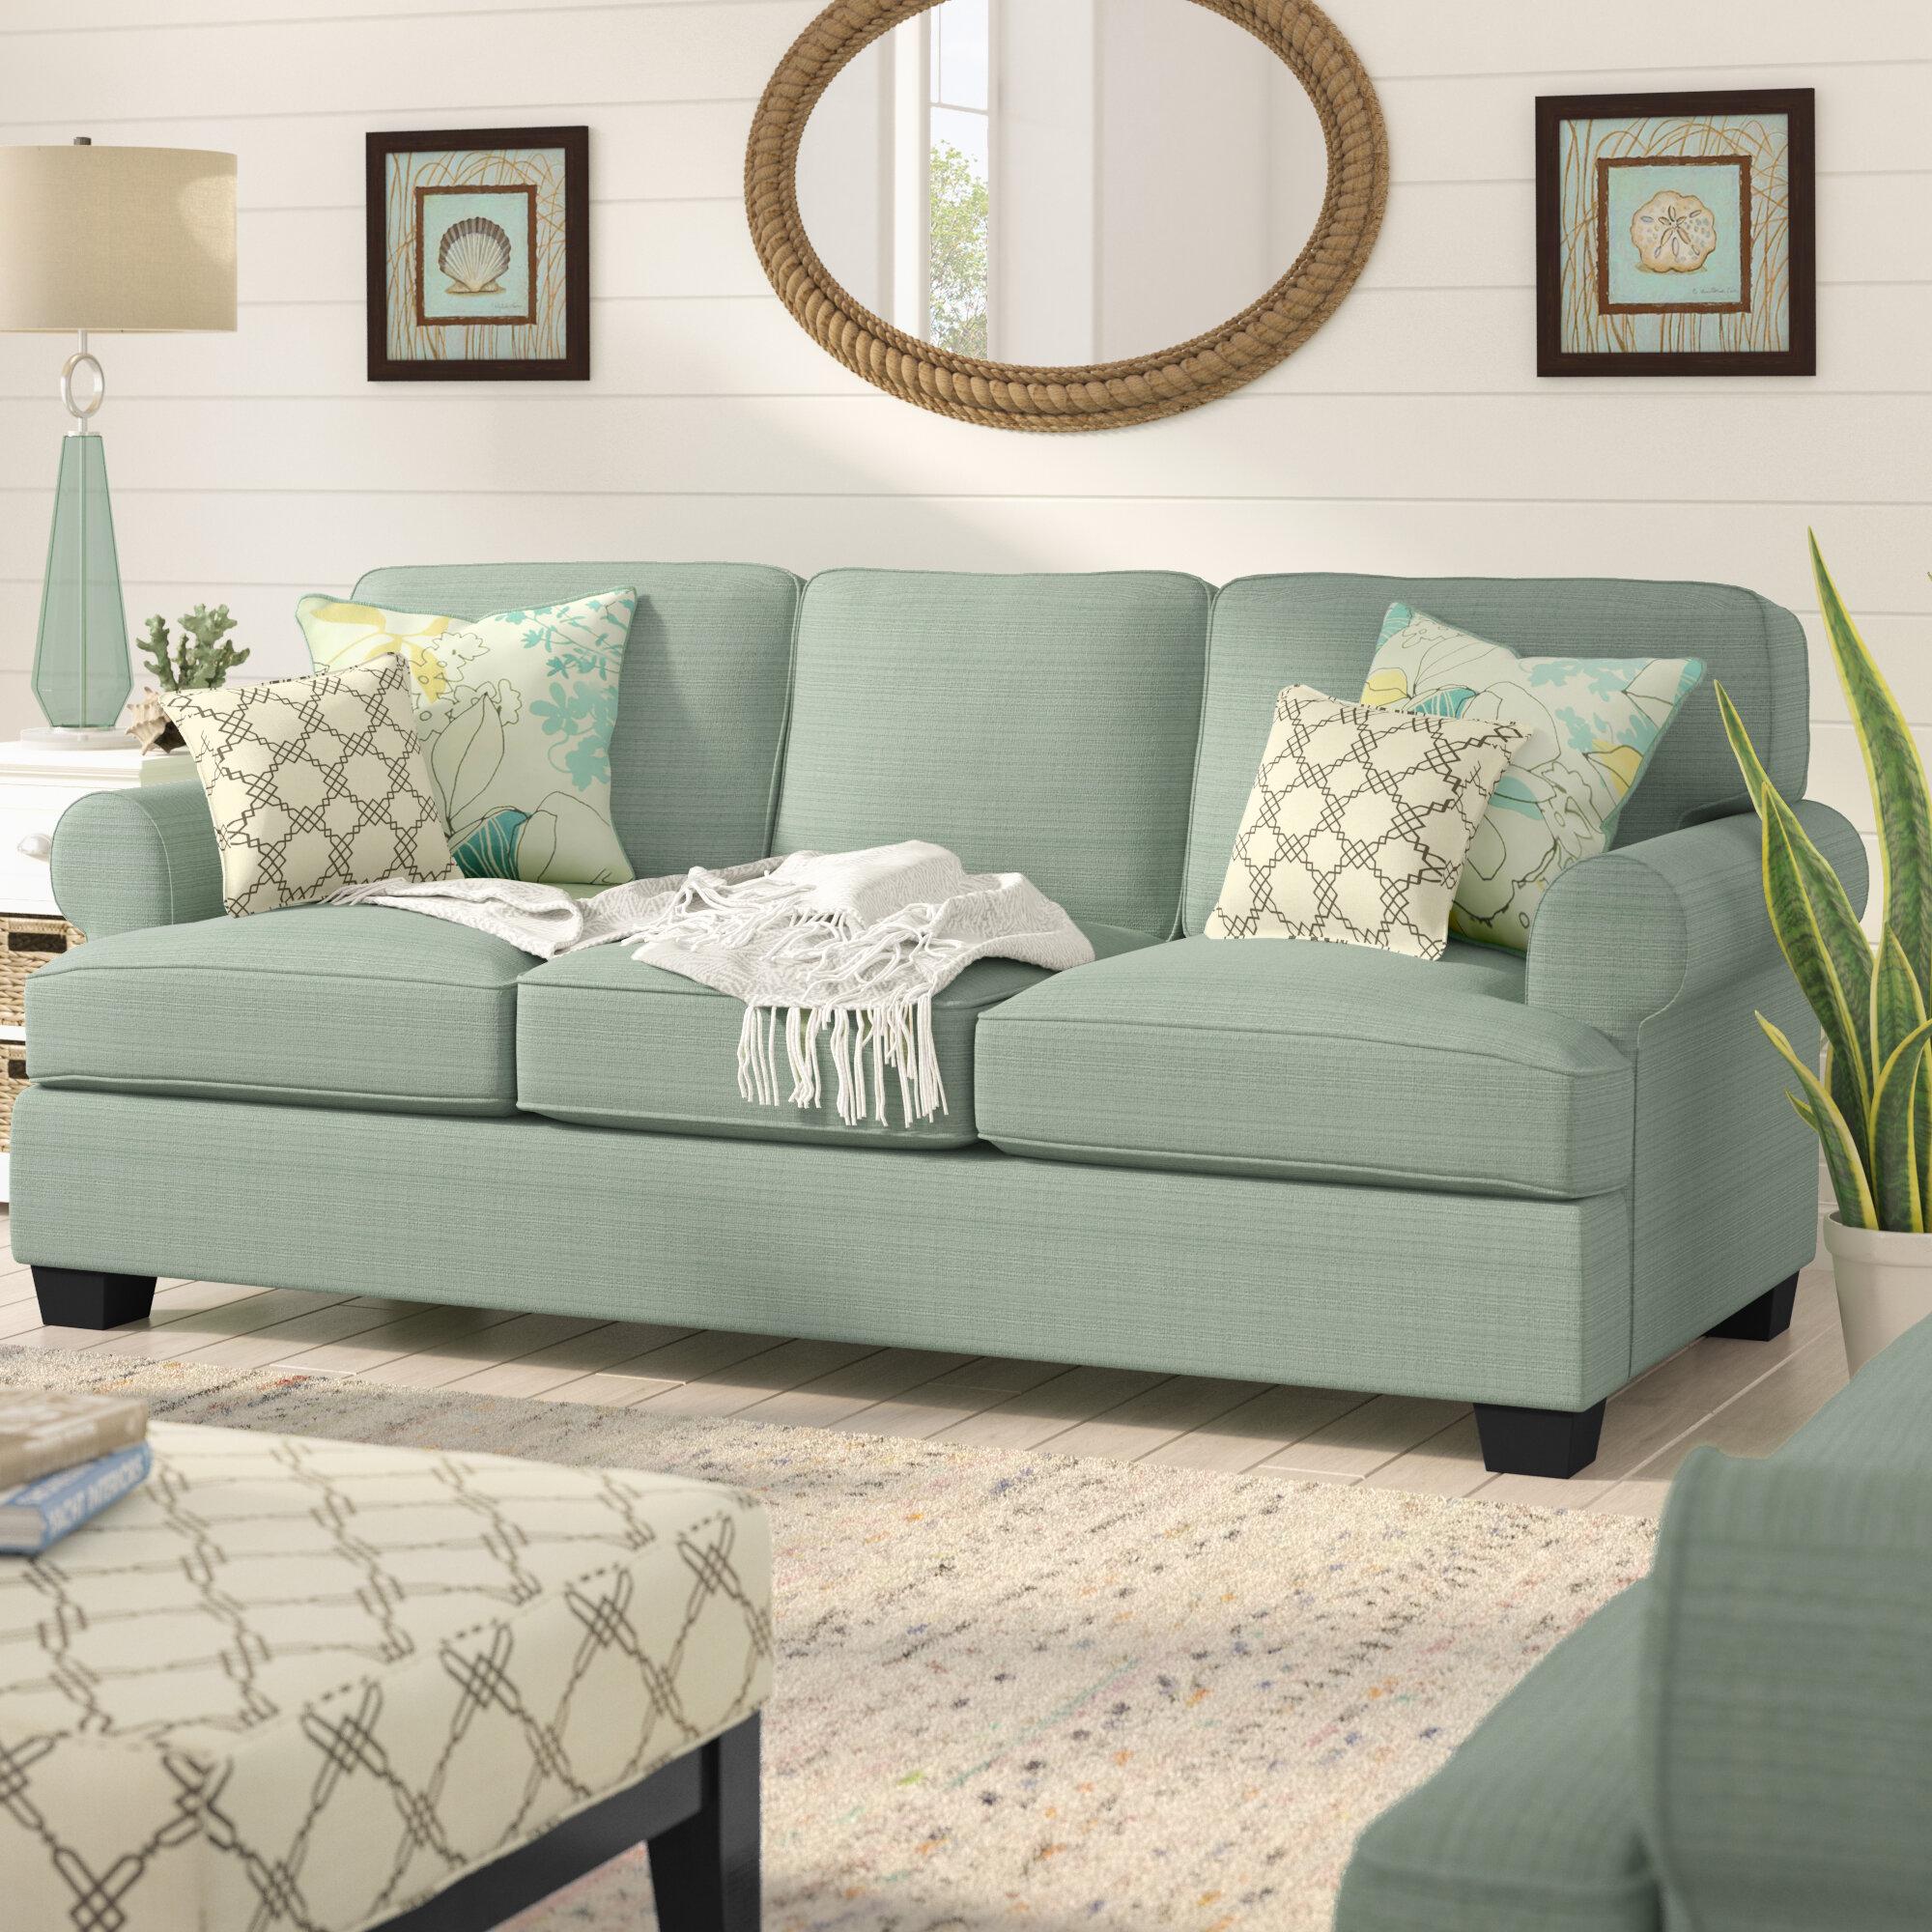 Phenomenal Queen Sleeper Sofa My Blog Cjindustries Chair Design For Home Cjindustriesco